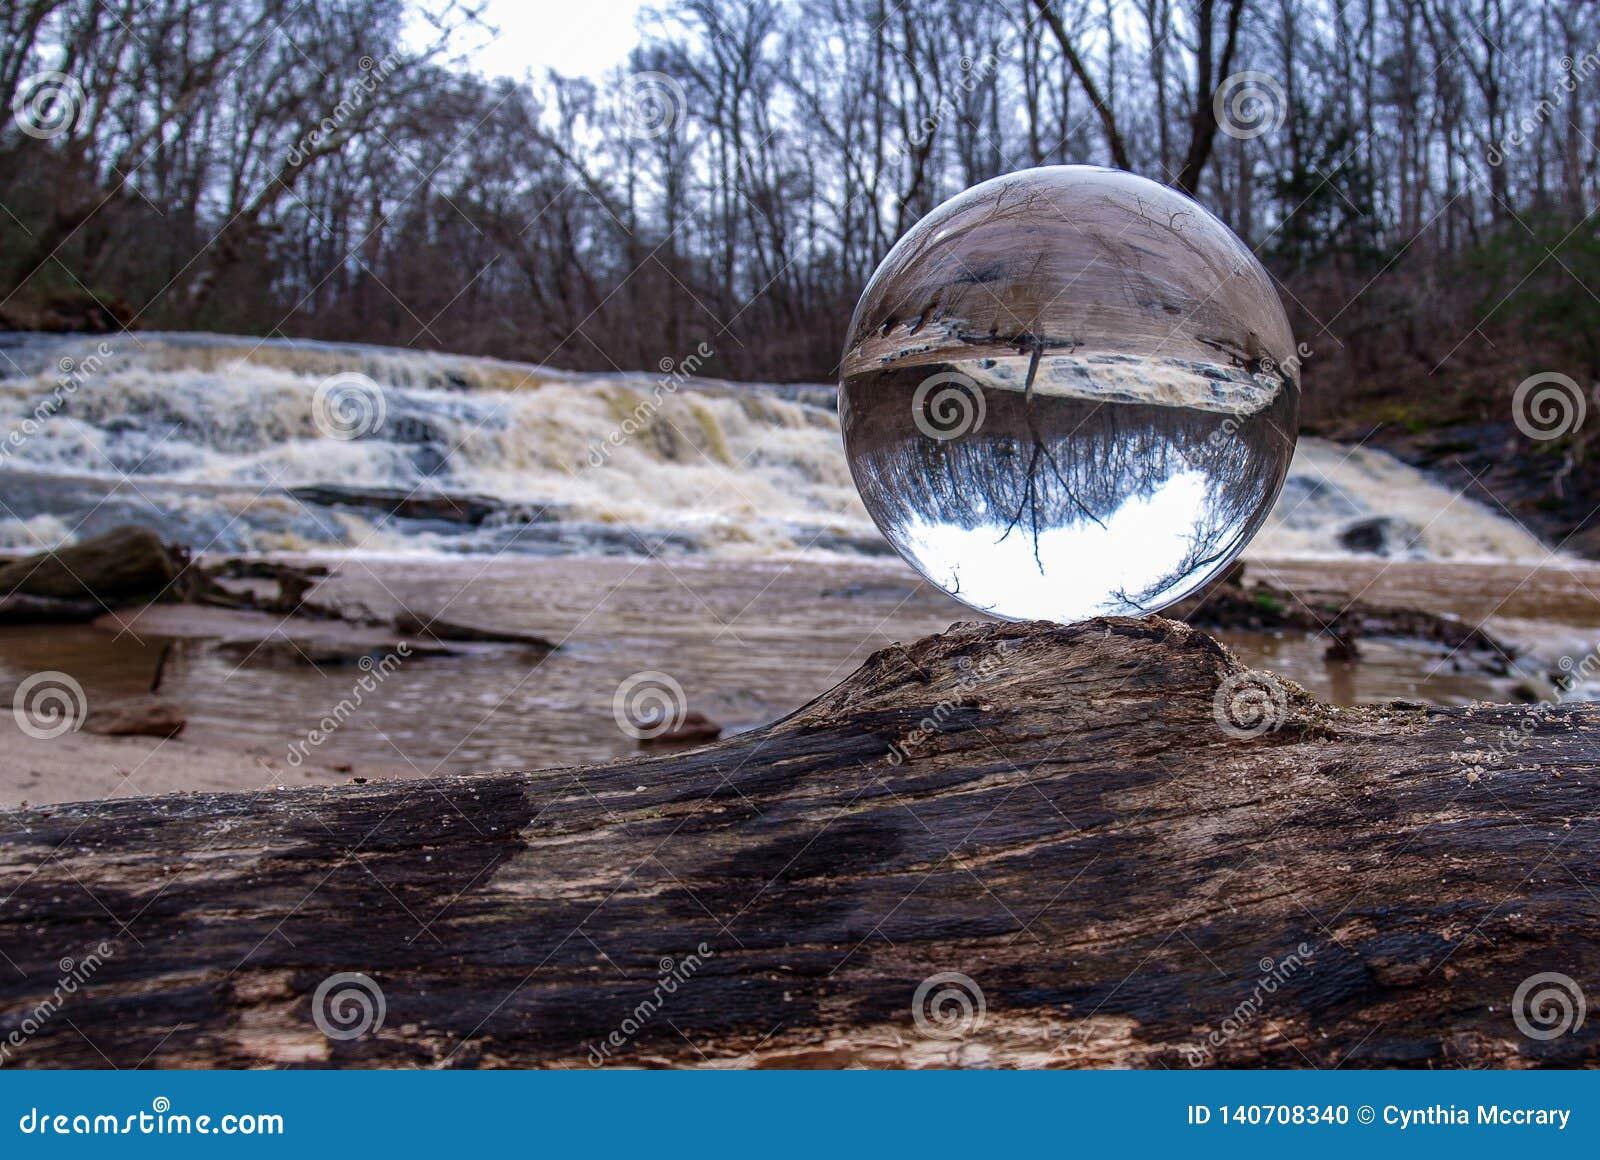 Crystal Ball Inverts Image